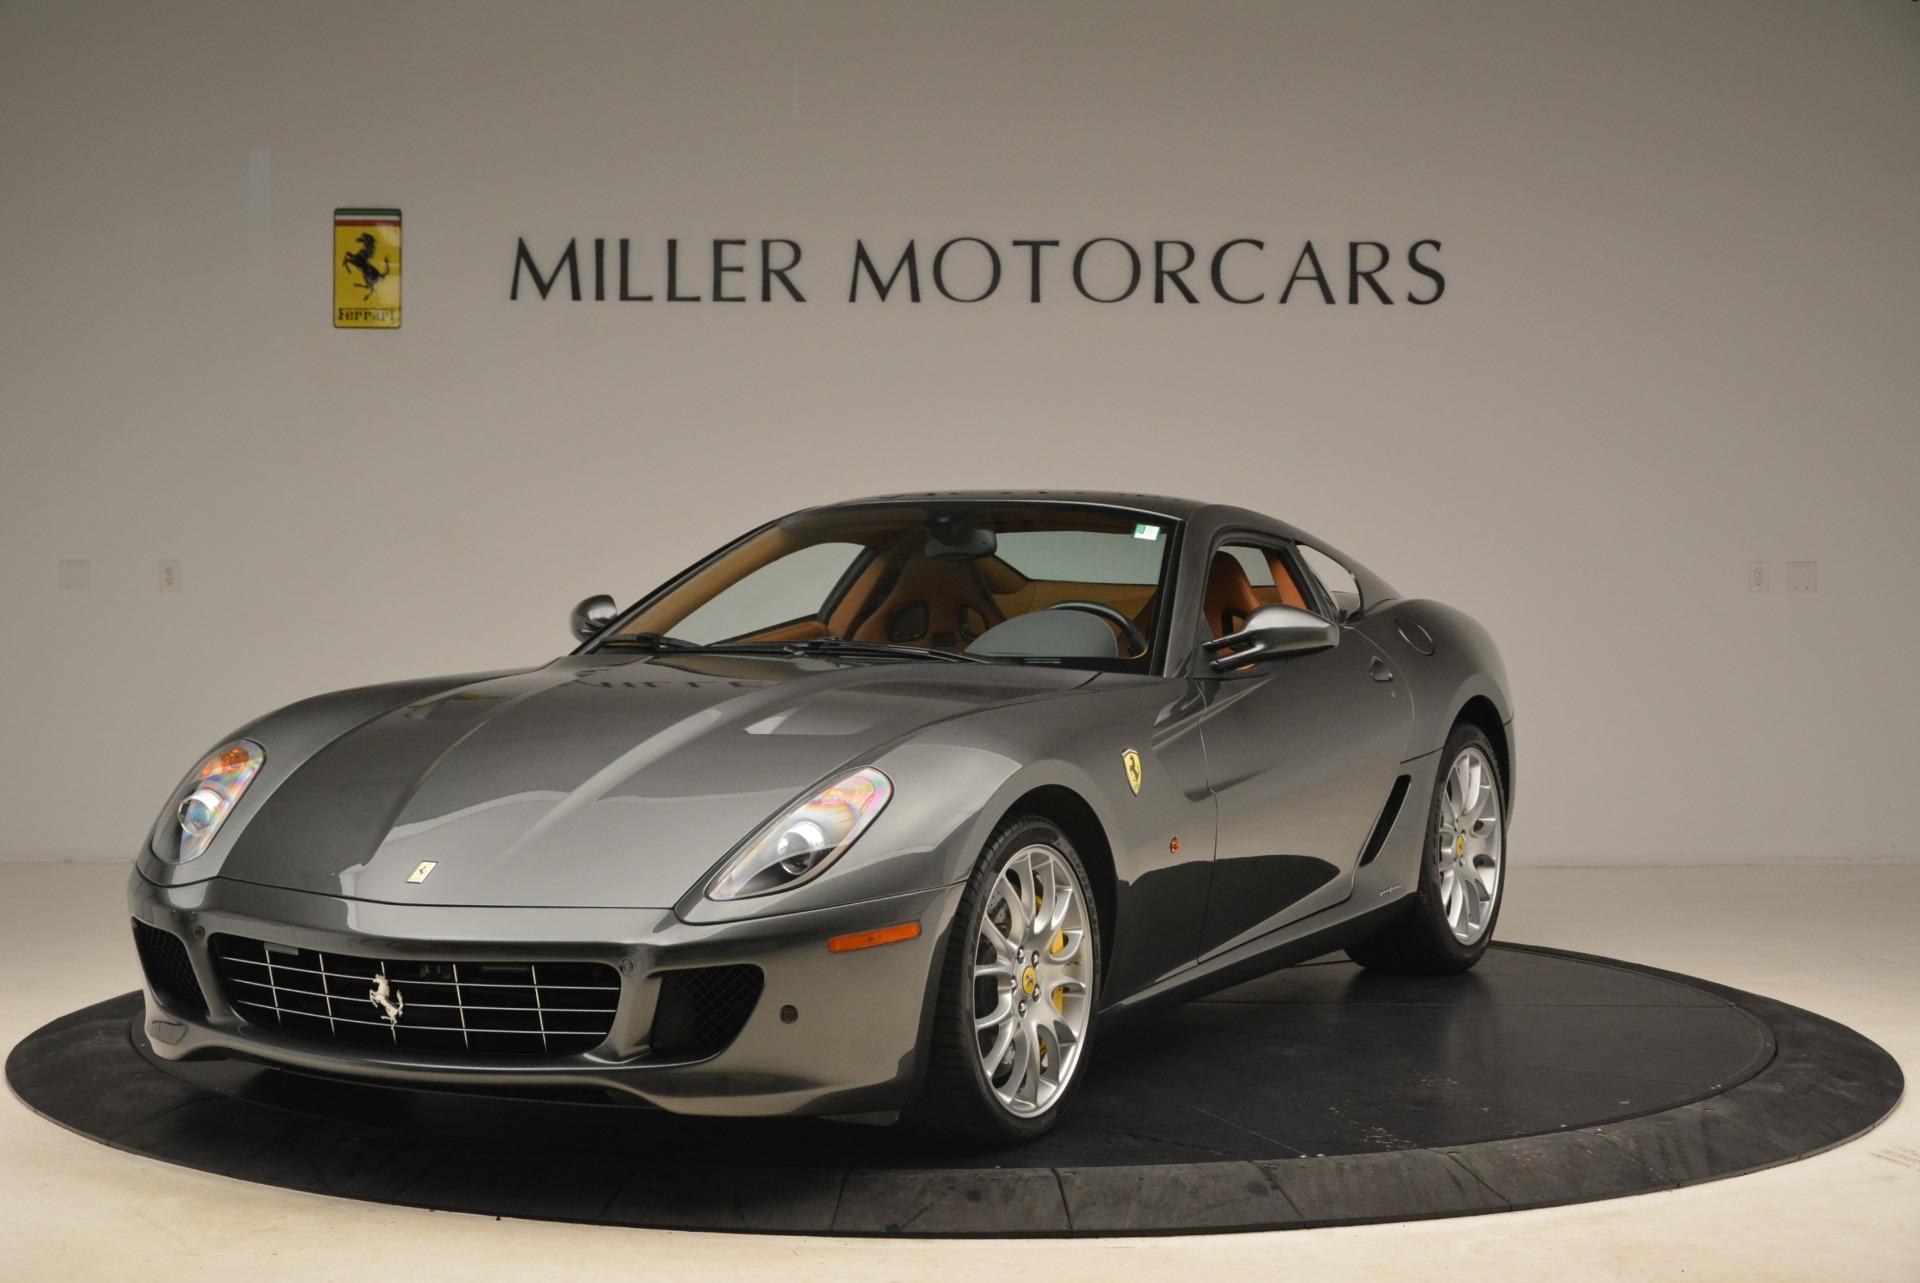 Used 2010 Ferrari 599 GTB Fiorano for sale Sold at Rolls-Royce Motor Cars Greenwich in Greenwich CT 06830 1